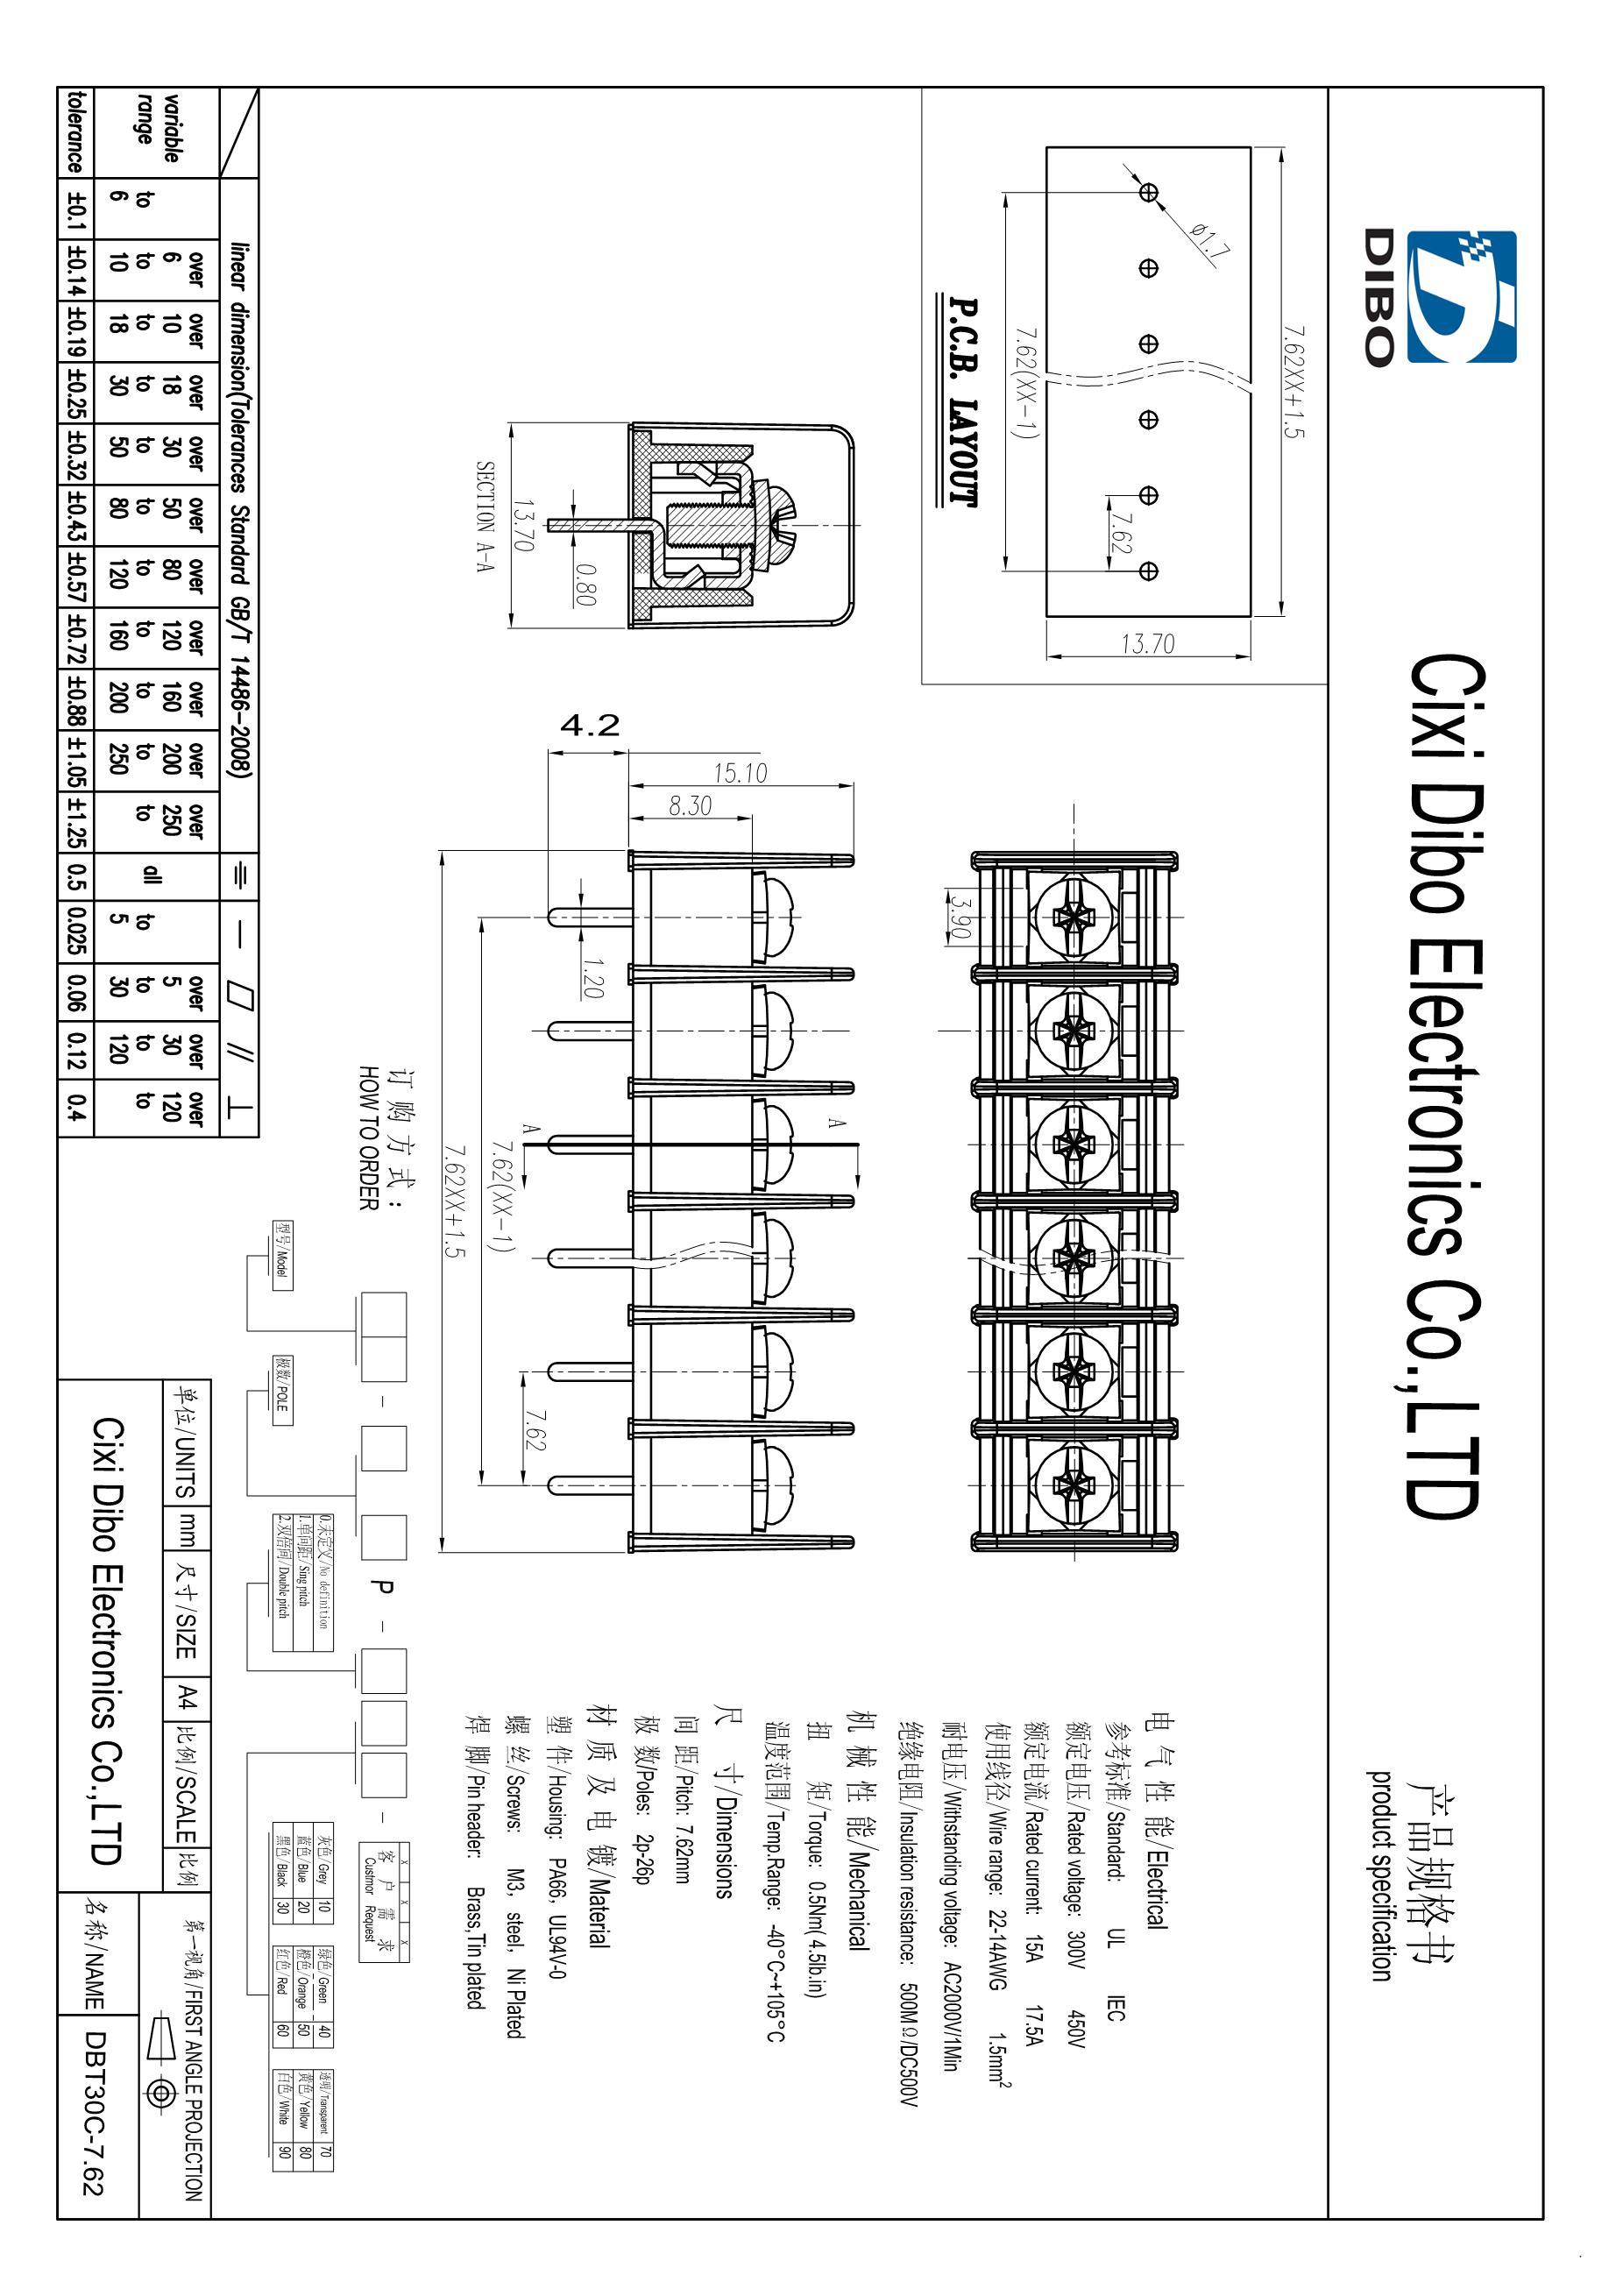 (10Pcs)SMCJ51A GFZ's pdf picture 1